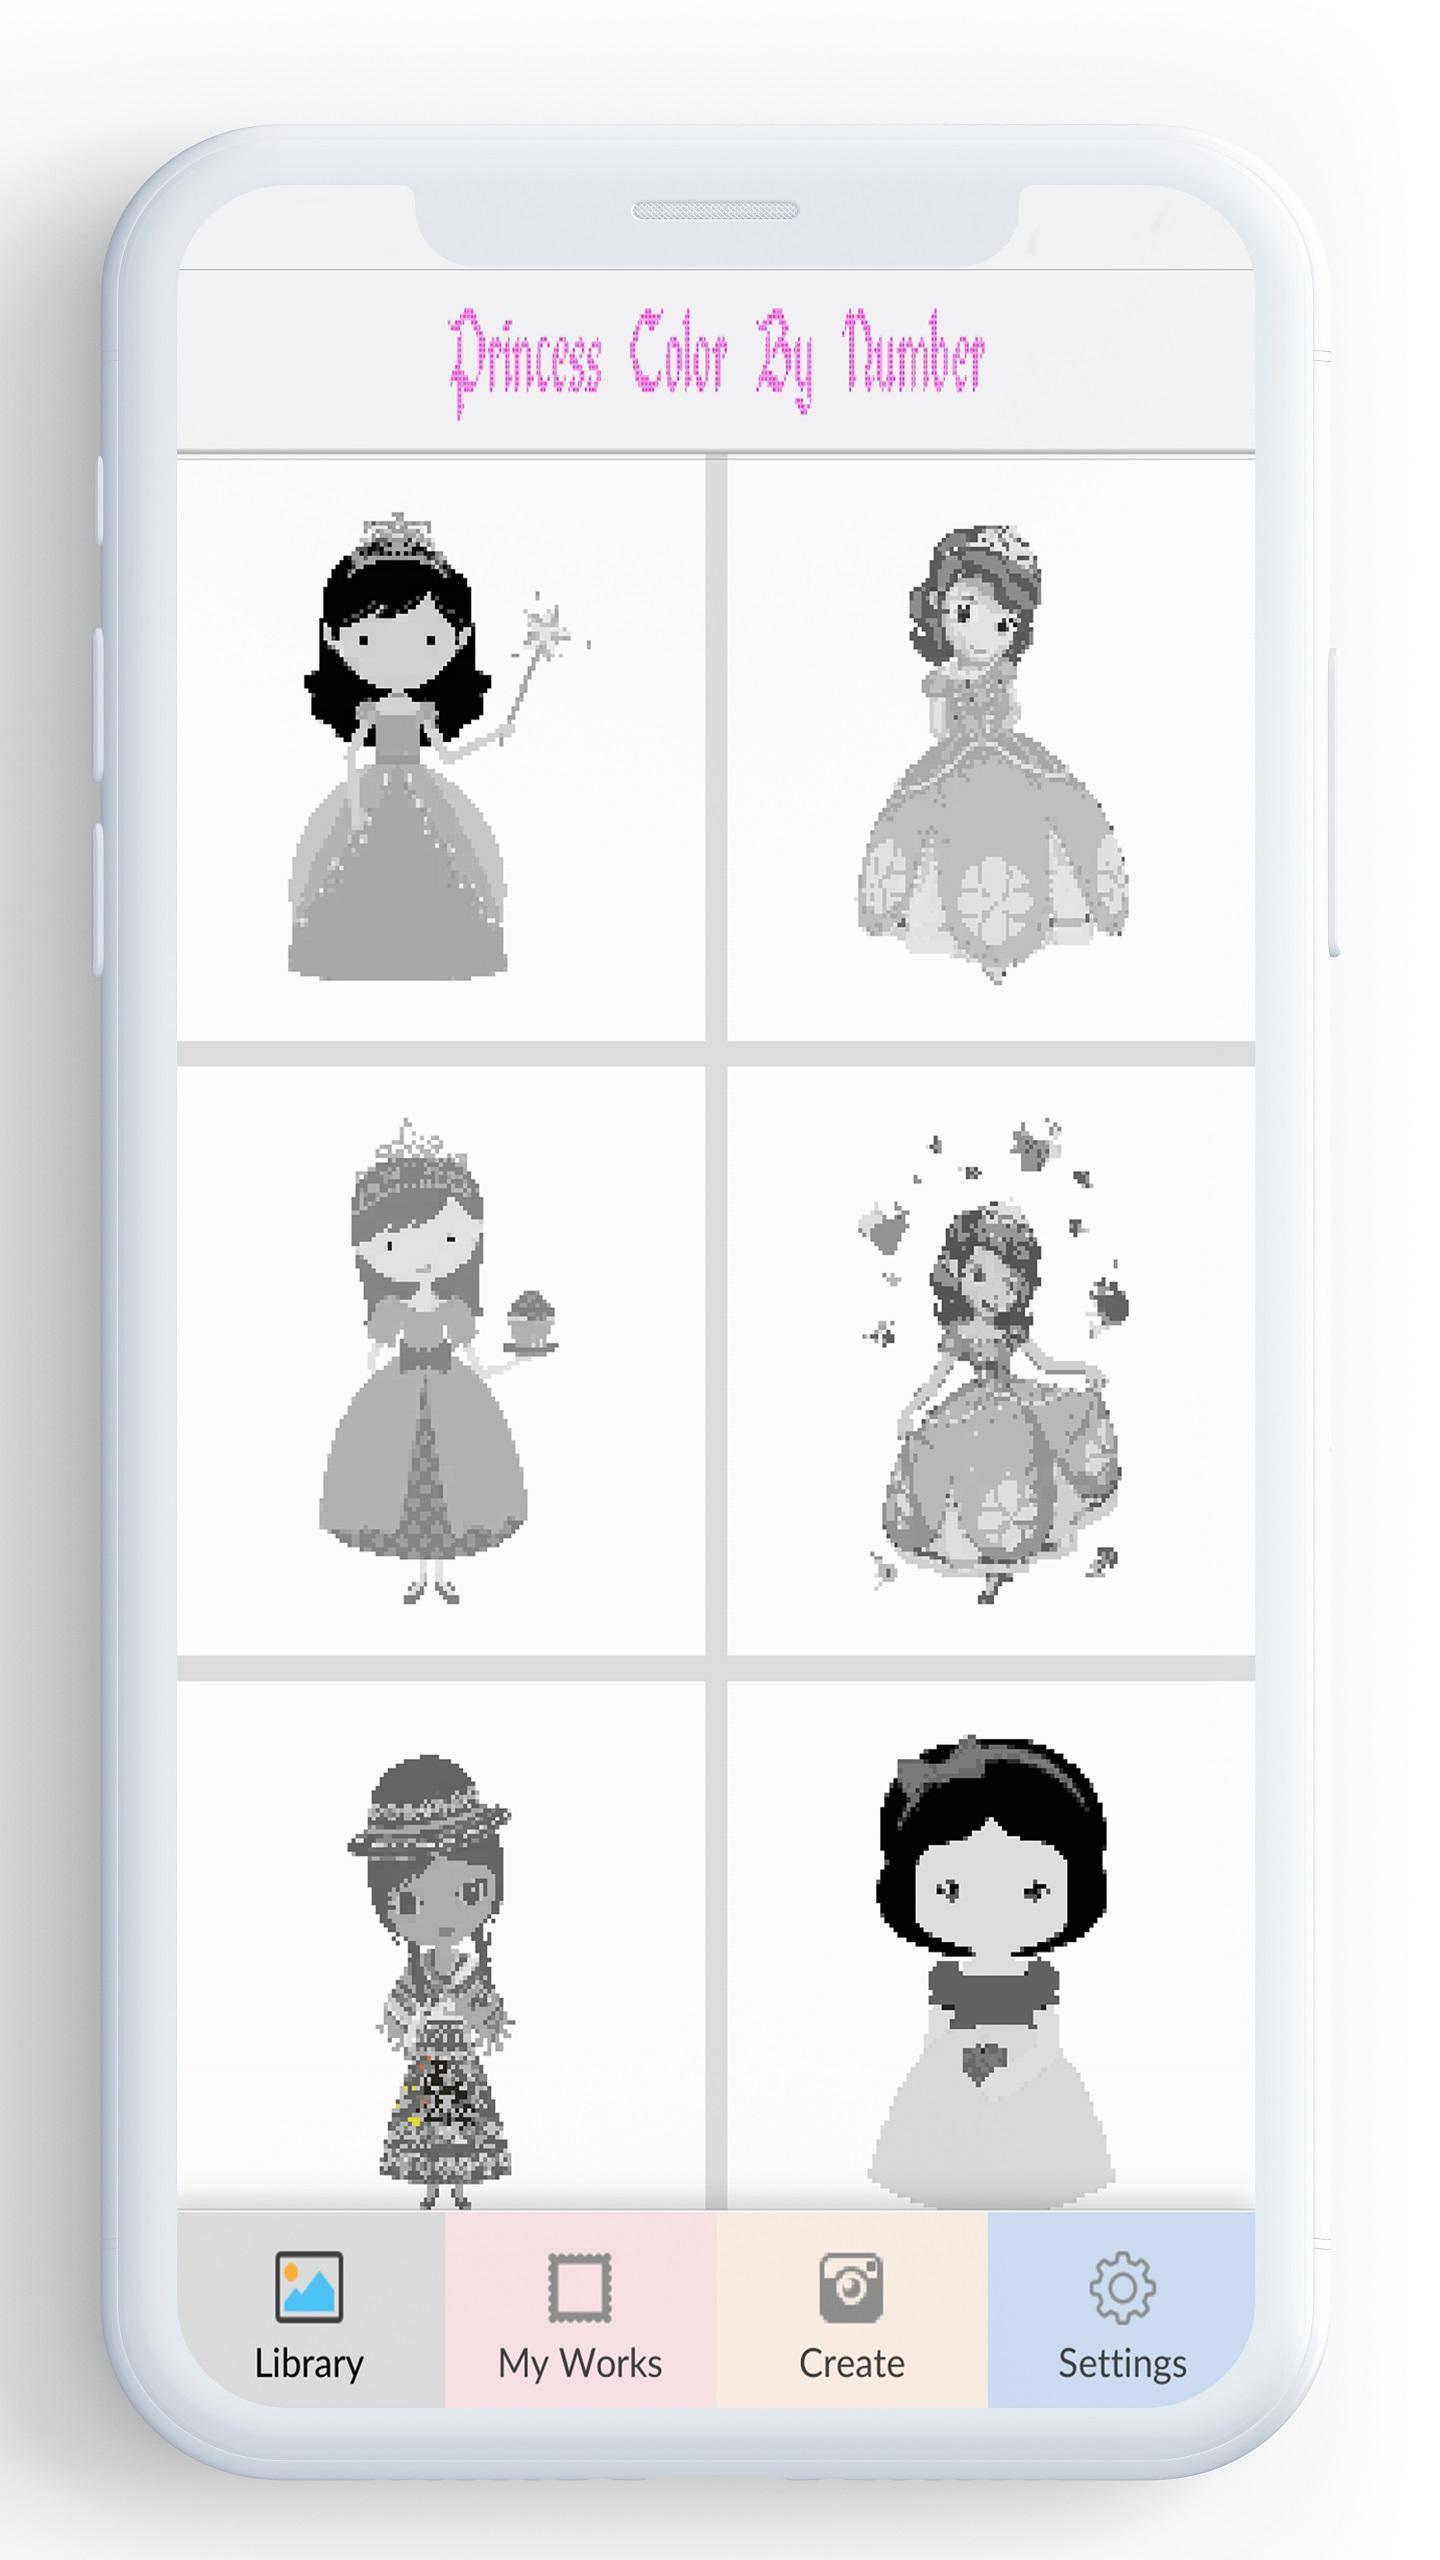 Android Icin Sayiya Gore Prenses Renk Prenses Boyama Oyunu Apk